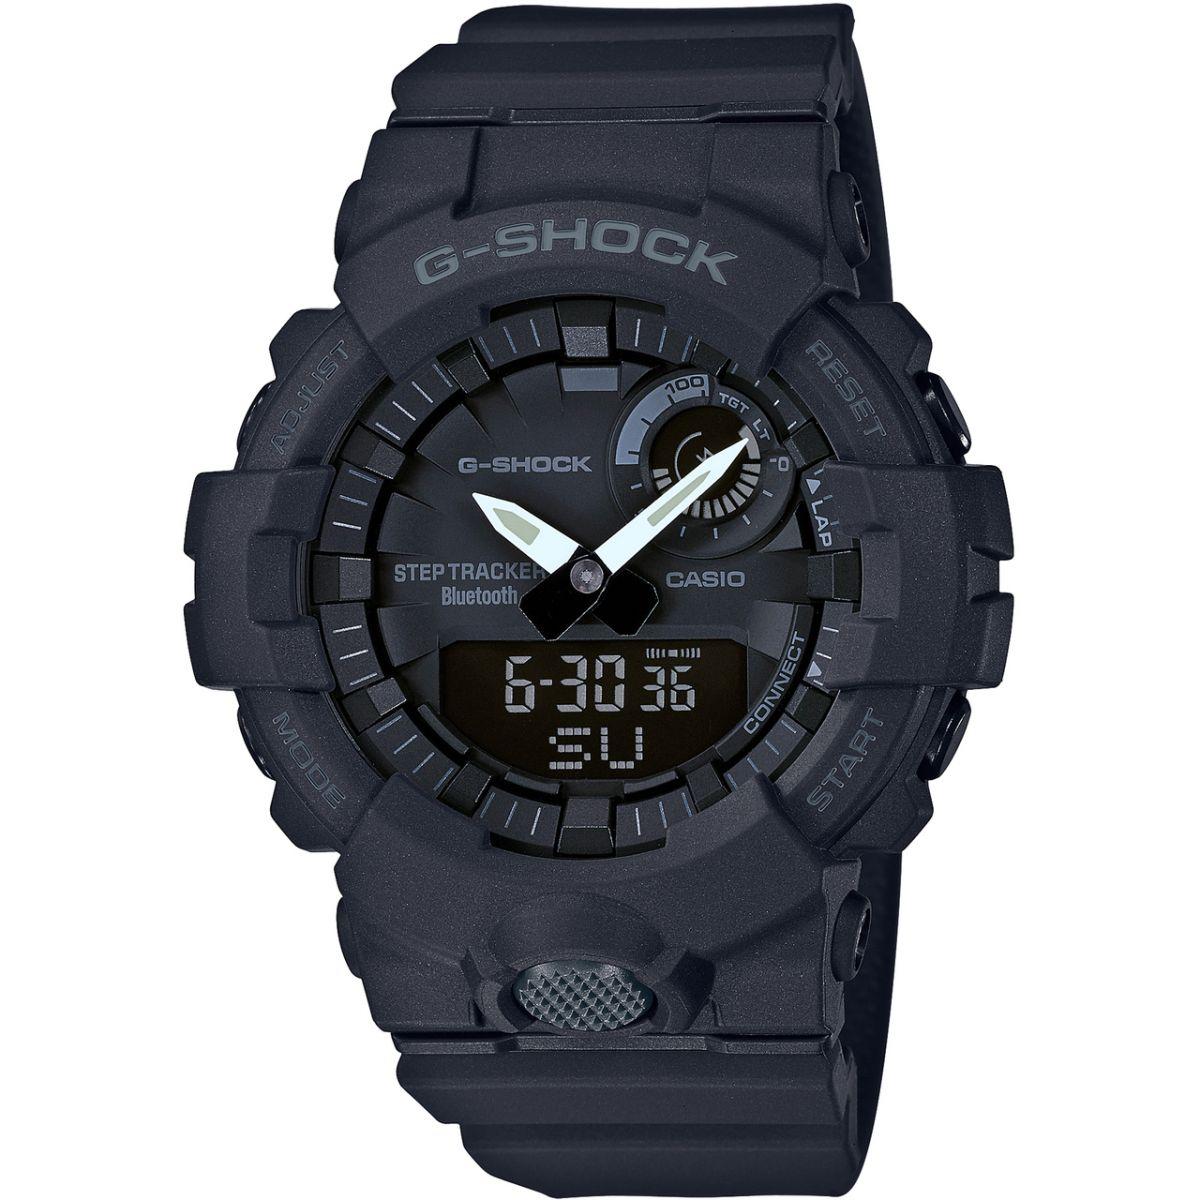 Casio G-shock STEP tracker GBA-800-1AER Bluetooth